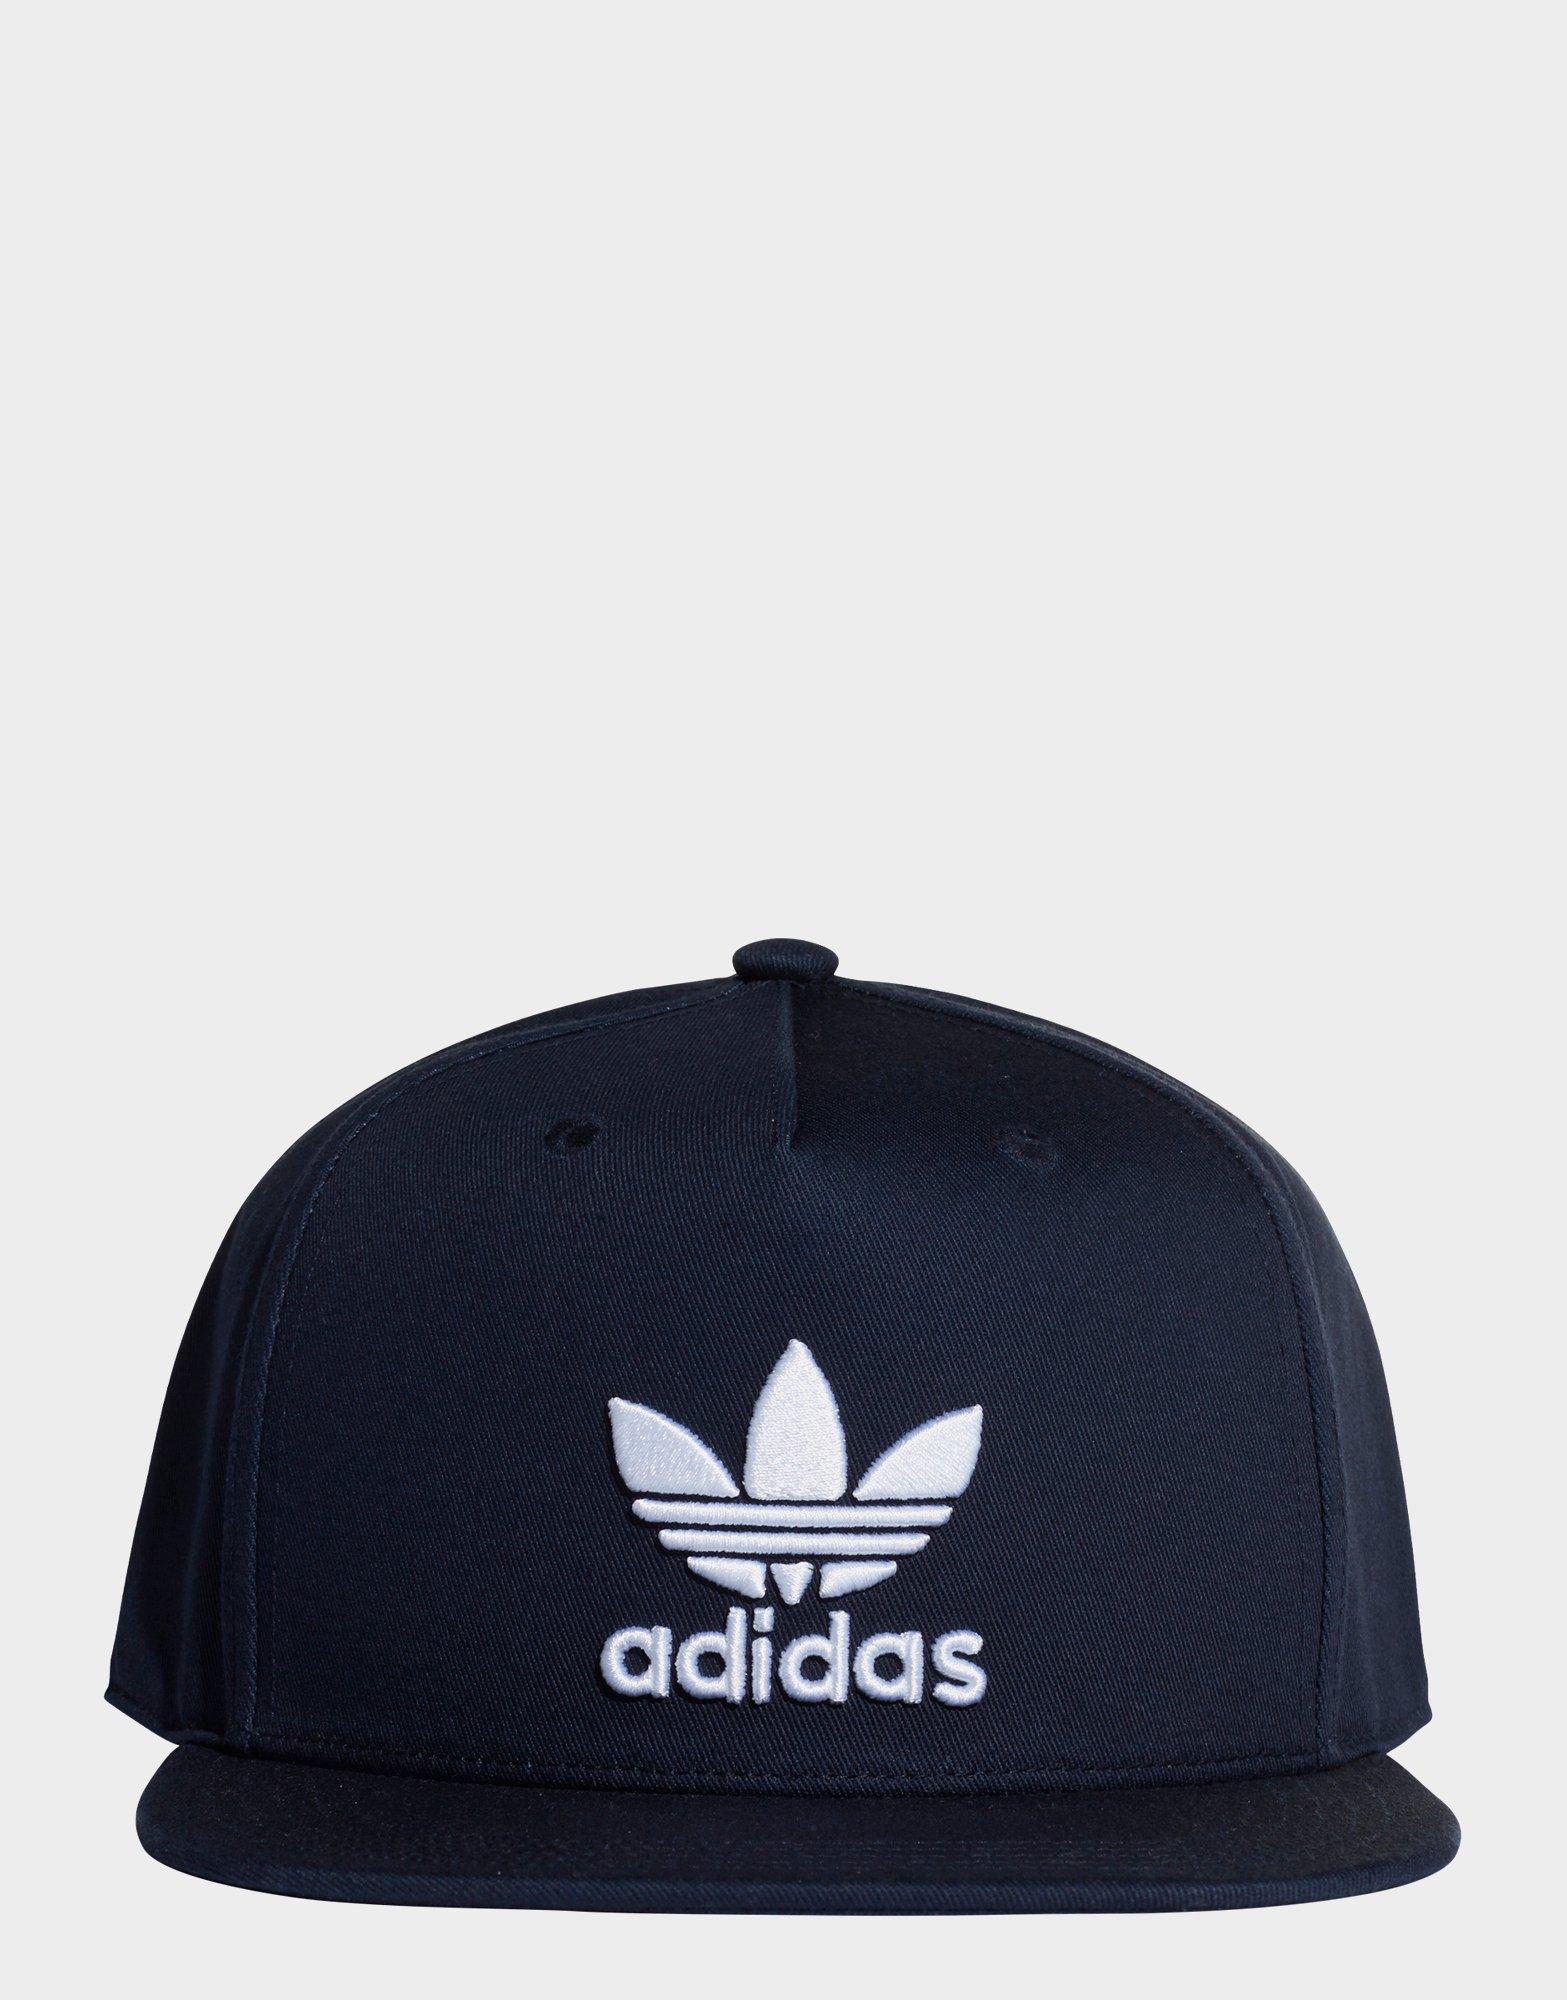 36314bd1fc4 Adidas Trefoil Snap-back Cap in Blue - Lyst